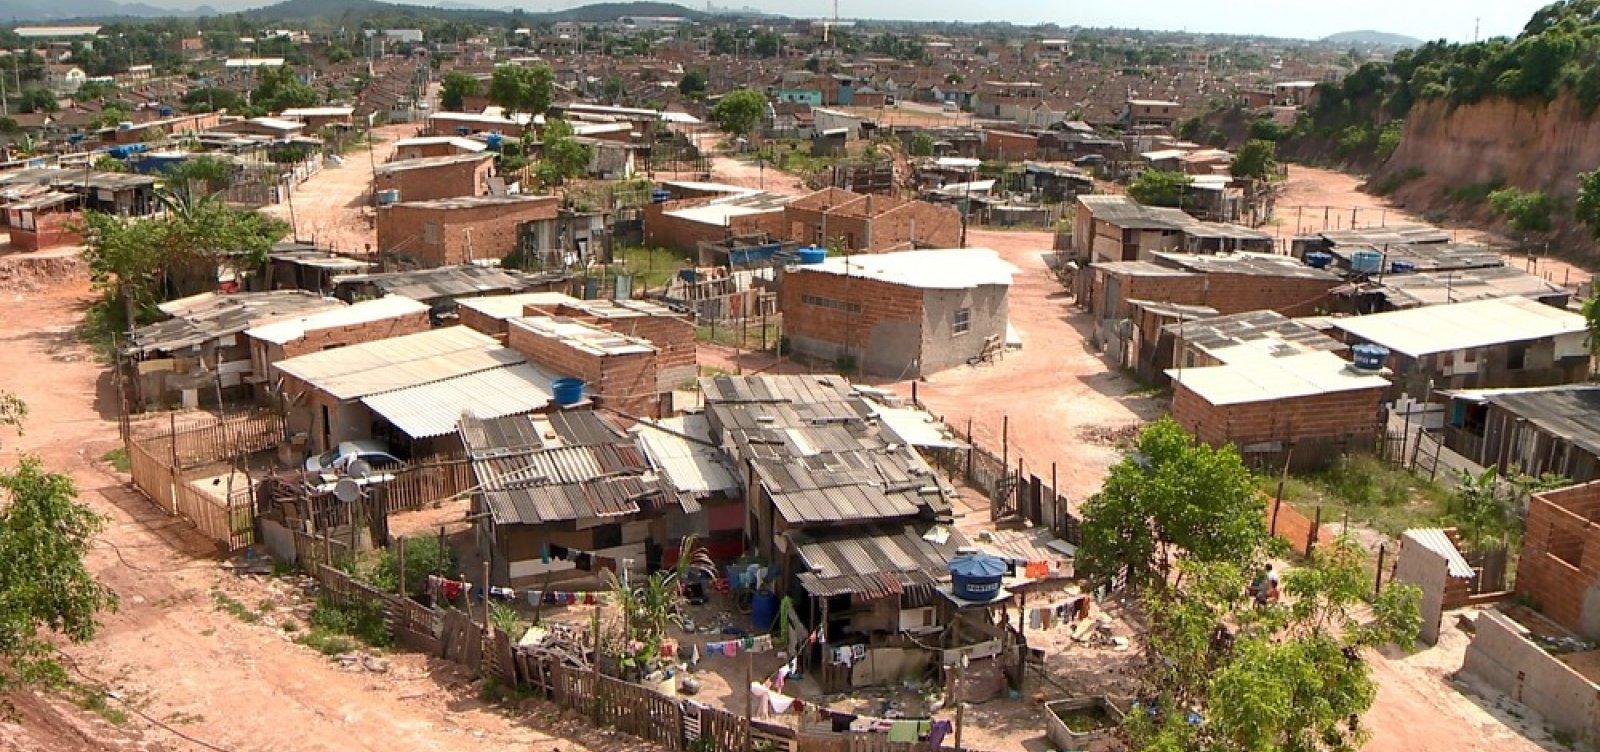 [Pobreza aumenta no Brasil, diz relatório do Banco Mundial]